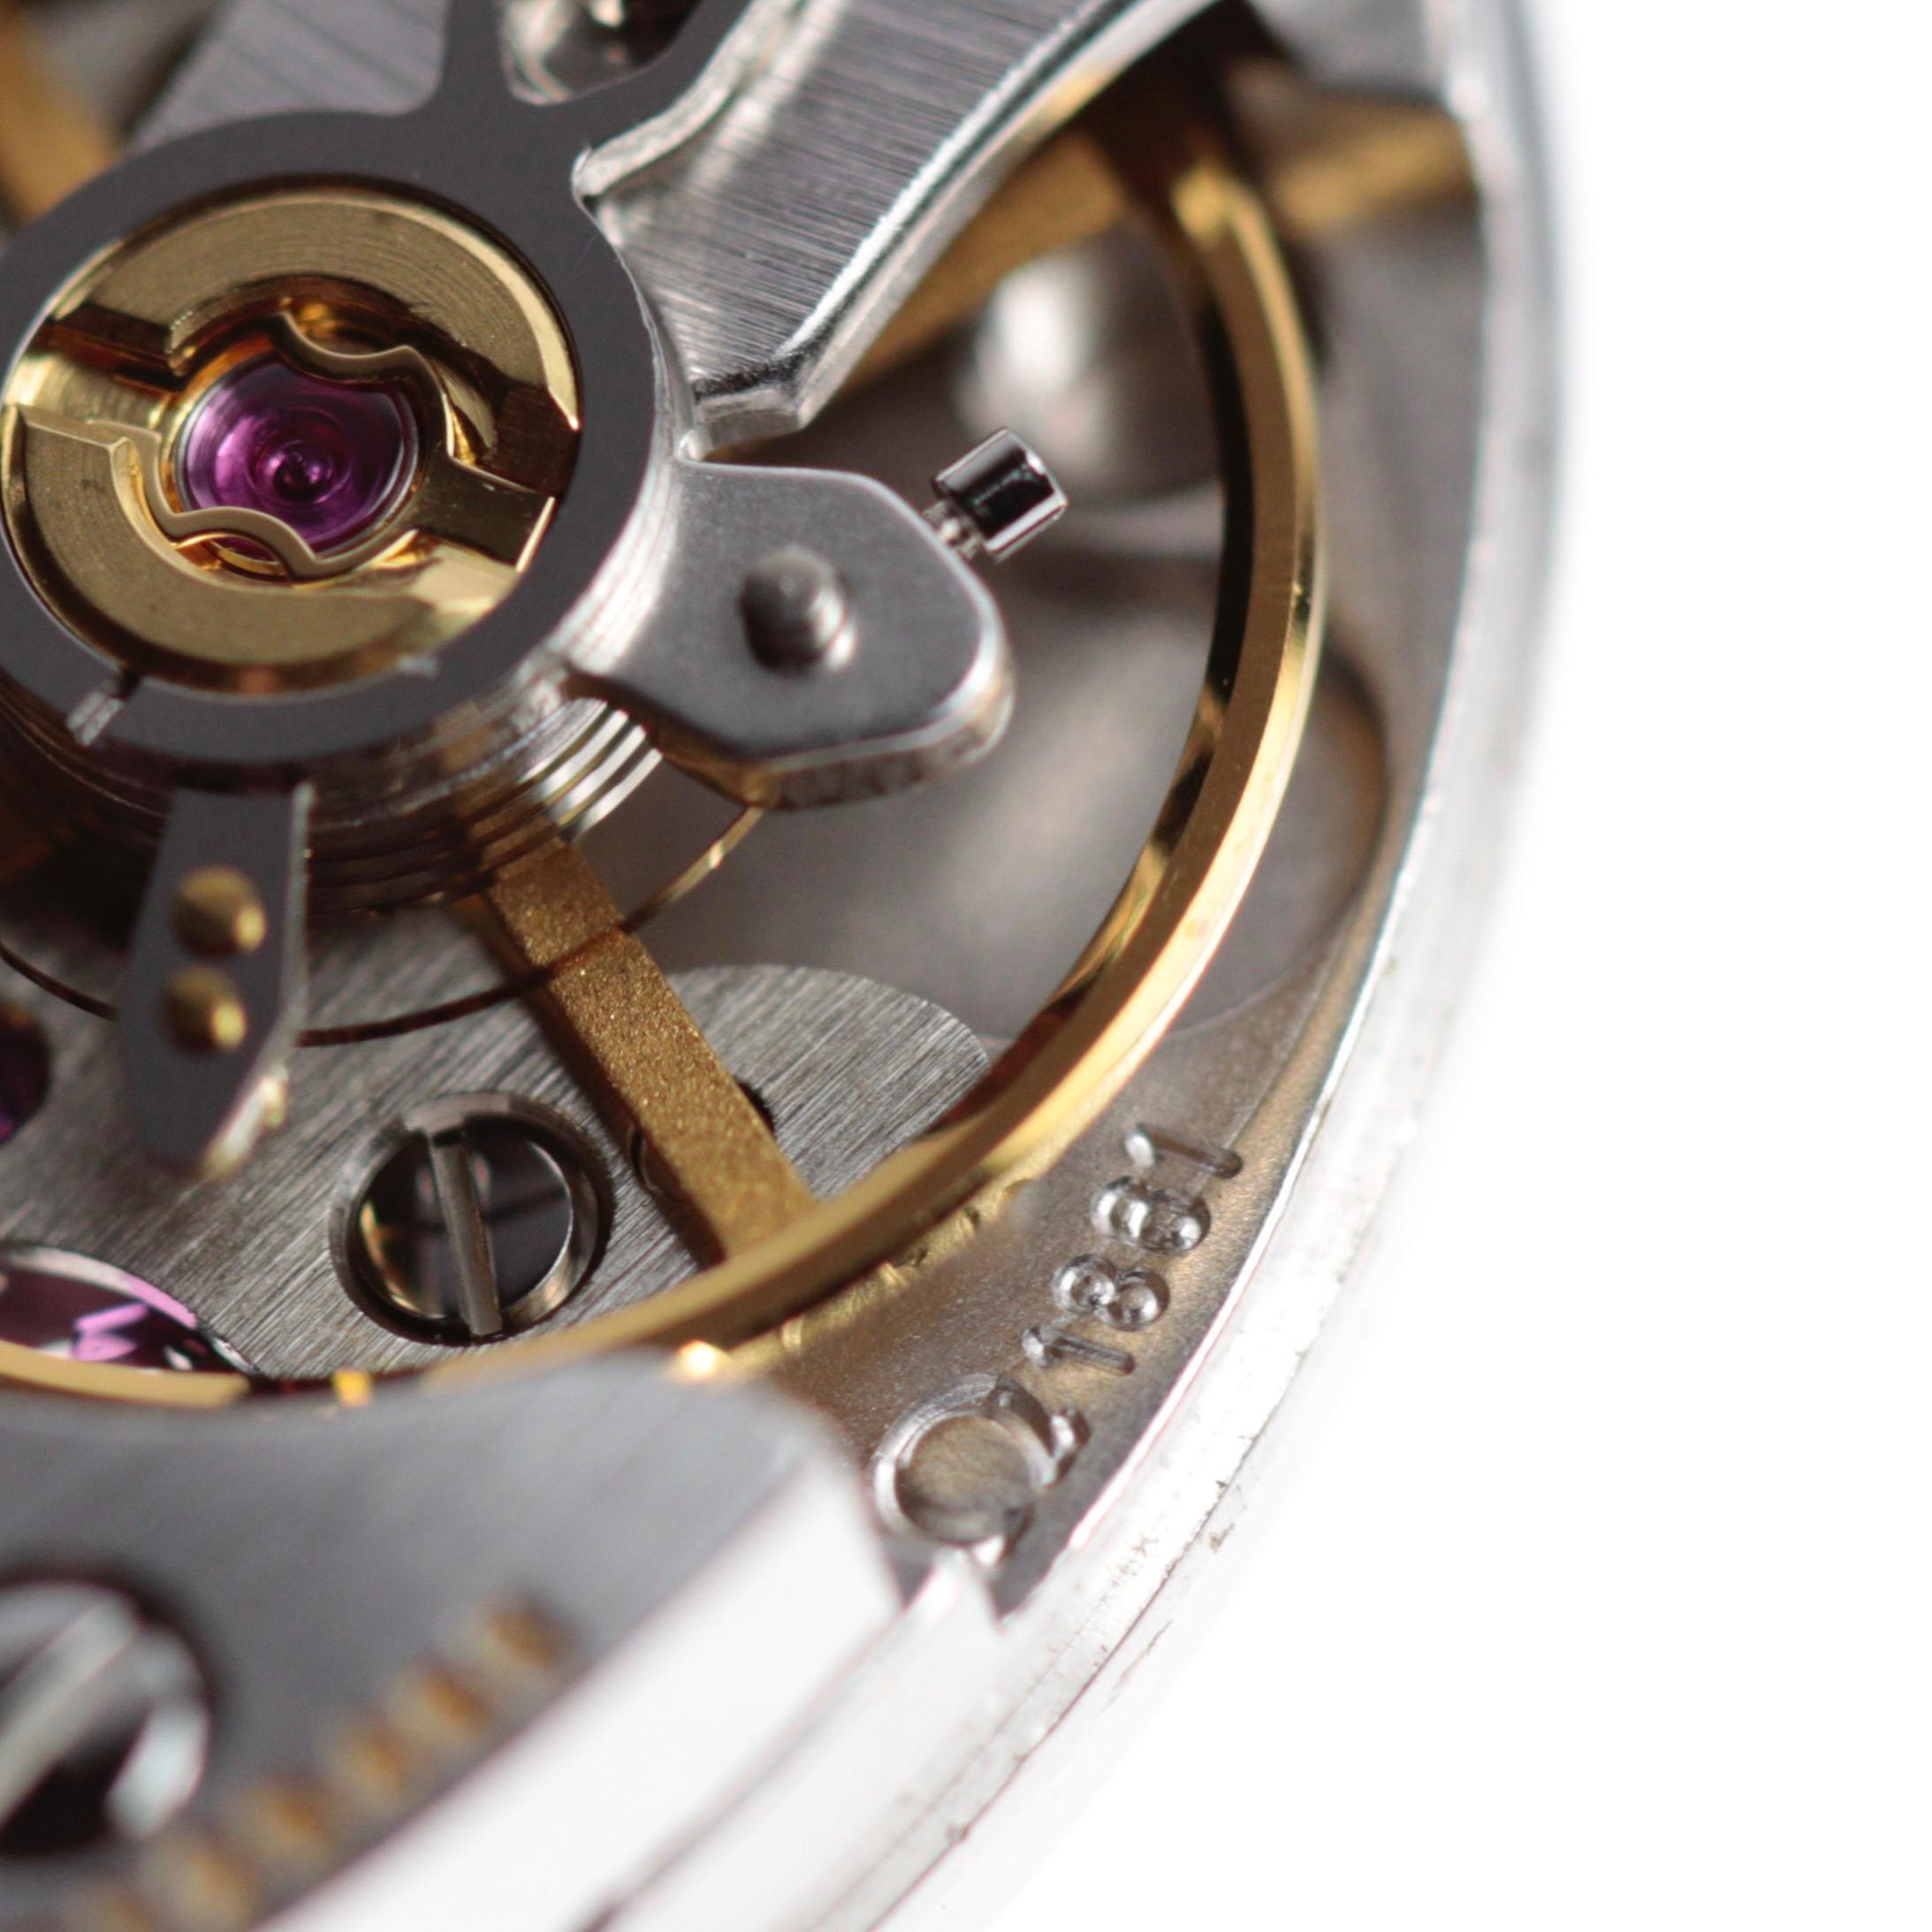 The calibre Omega 1861, below the balance wheel